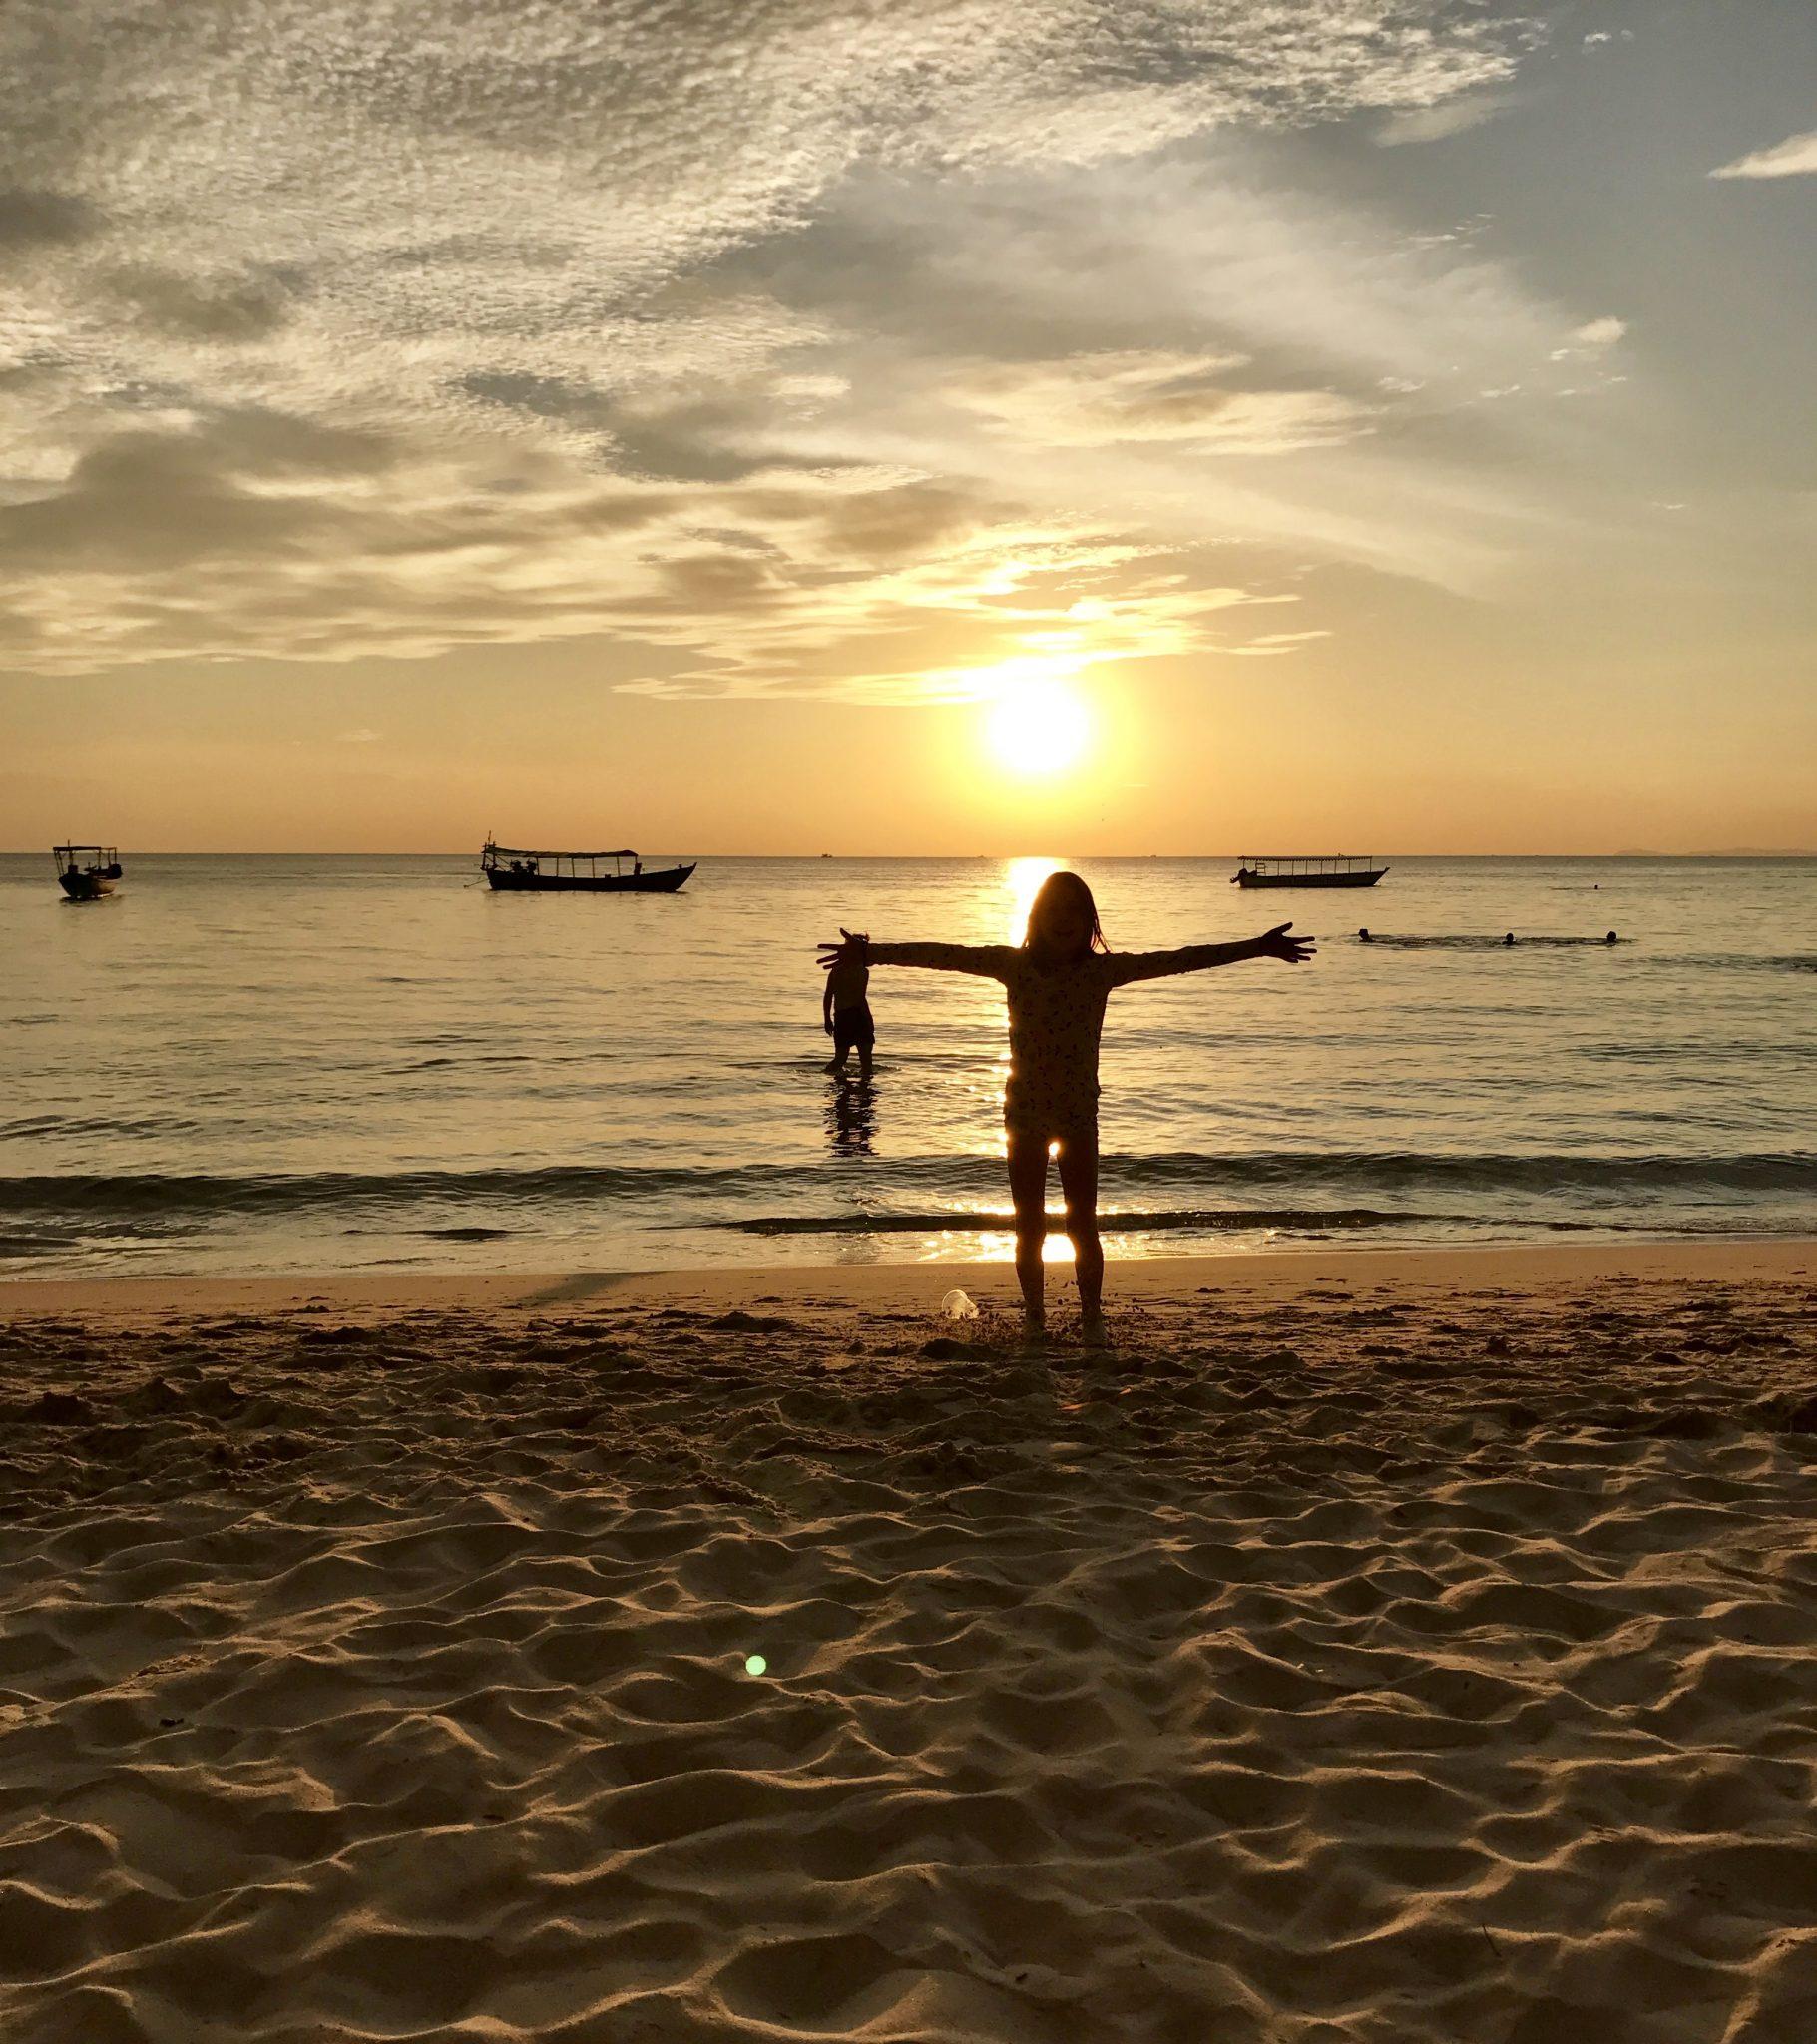 sunset, beach, cambodia, boats, water, sand